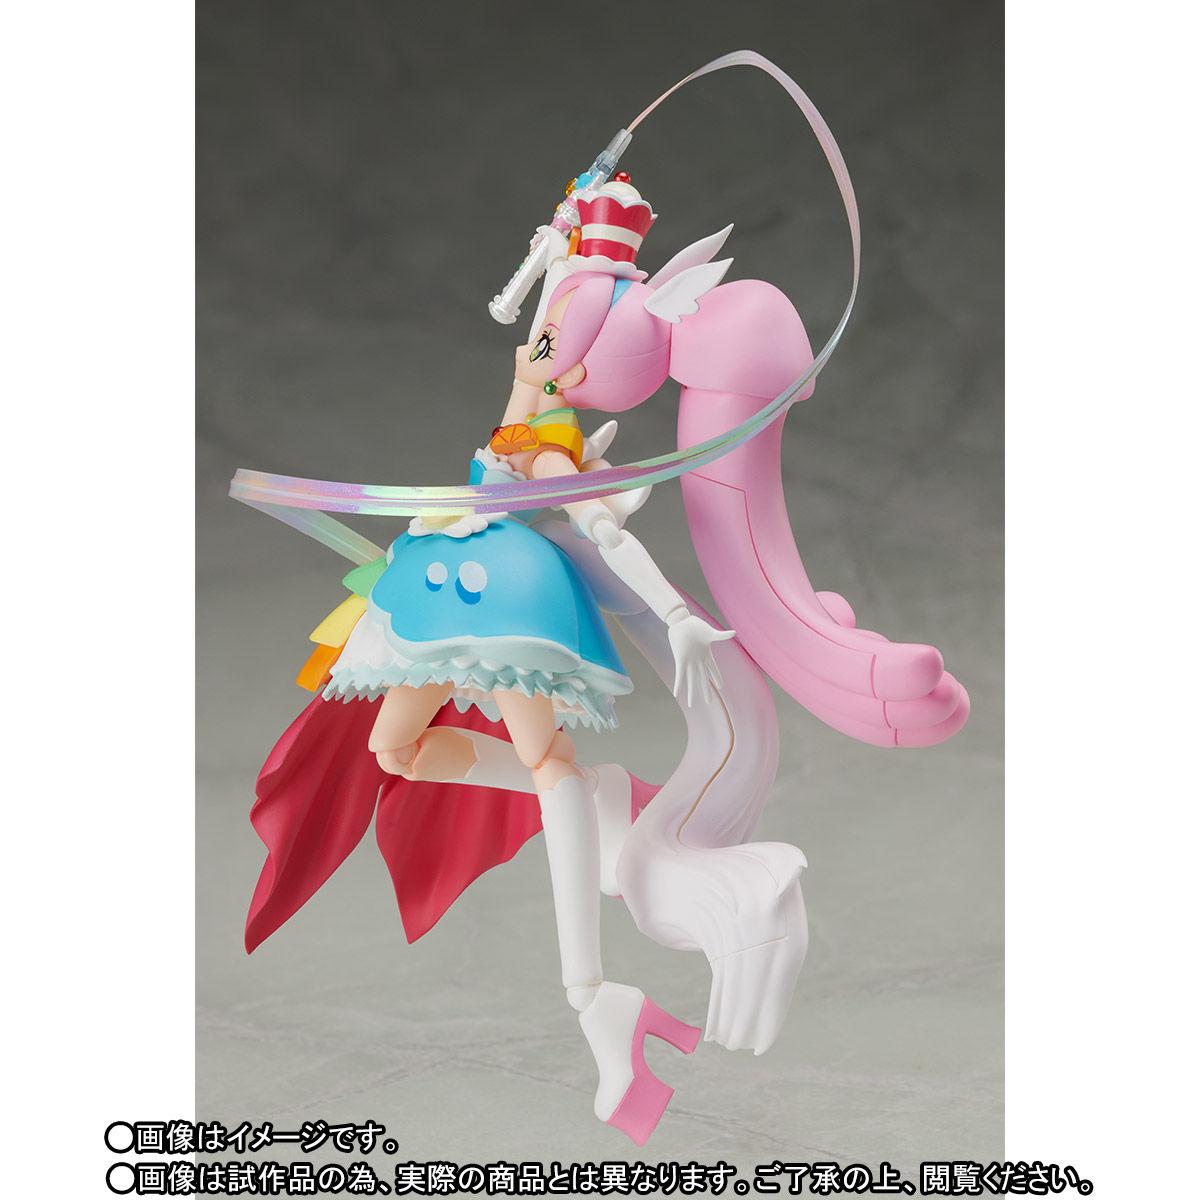 S.H.フィギュアーツ『キュアパルフェ』可動フィギュア-006